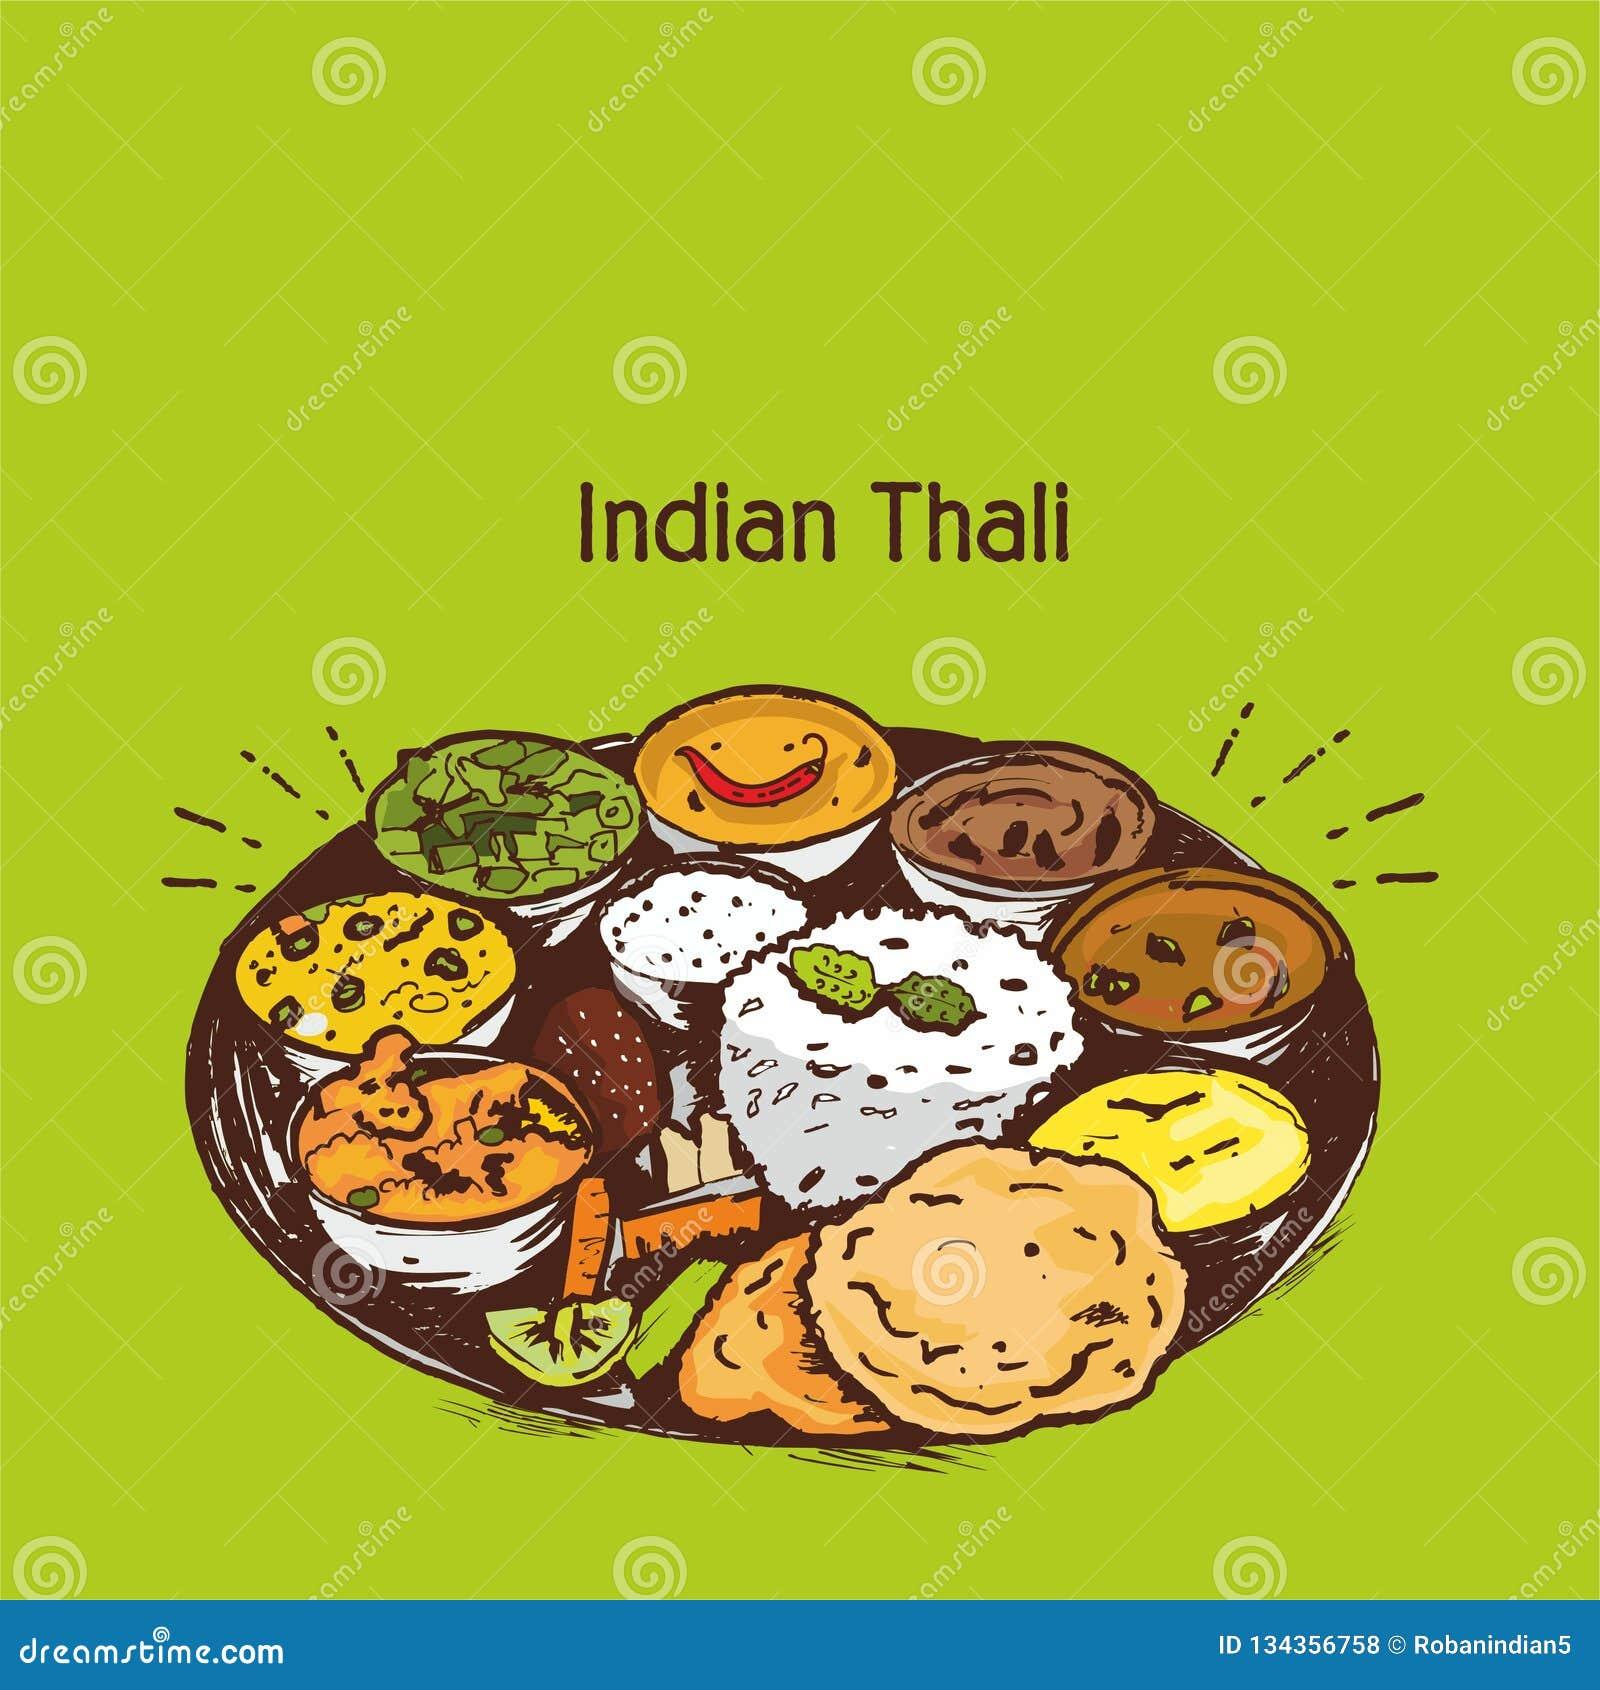 Indian Thali Vector Illustration Or Clip Art Stock Vector ...